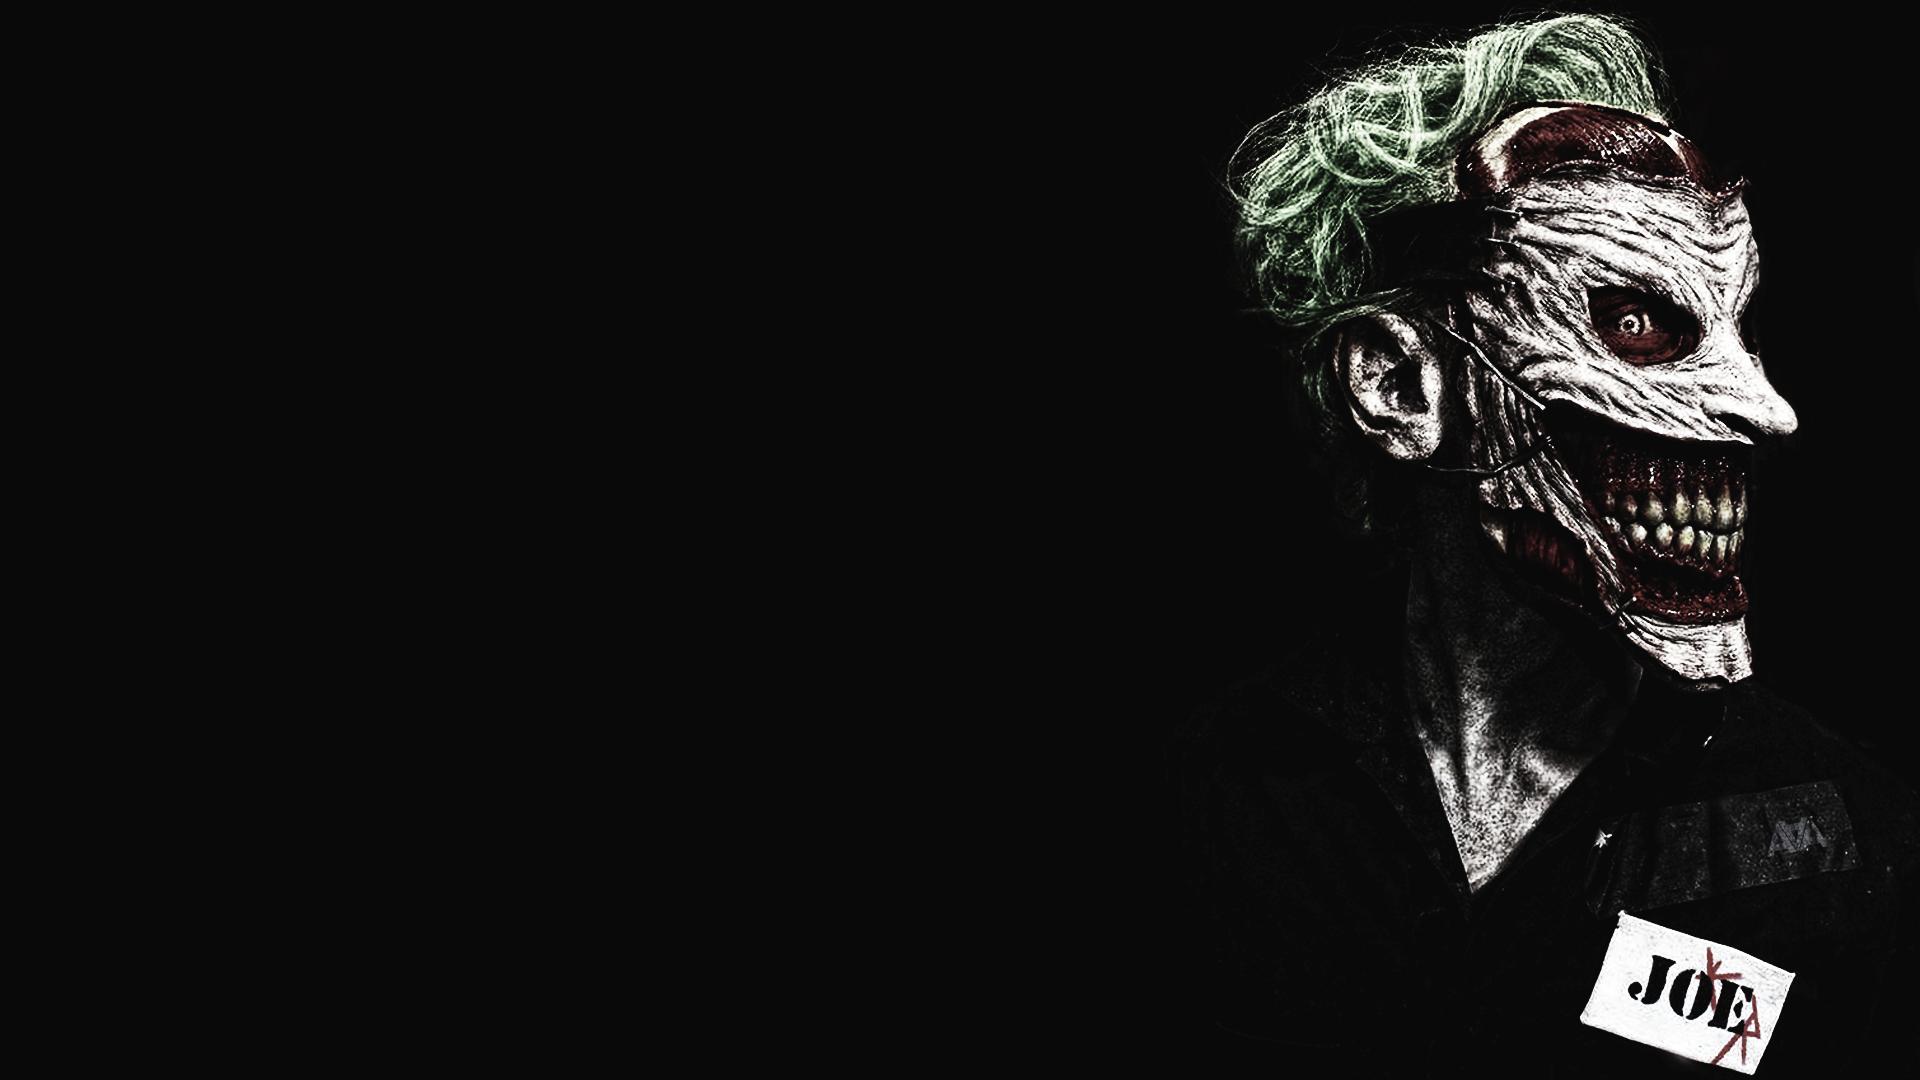 Joker Wallpaper Images ~ Sdeerwallpaper